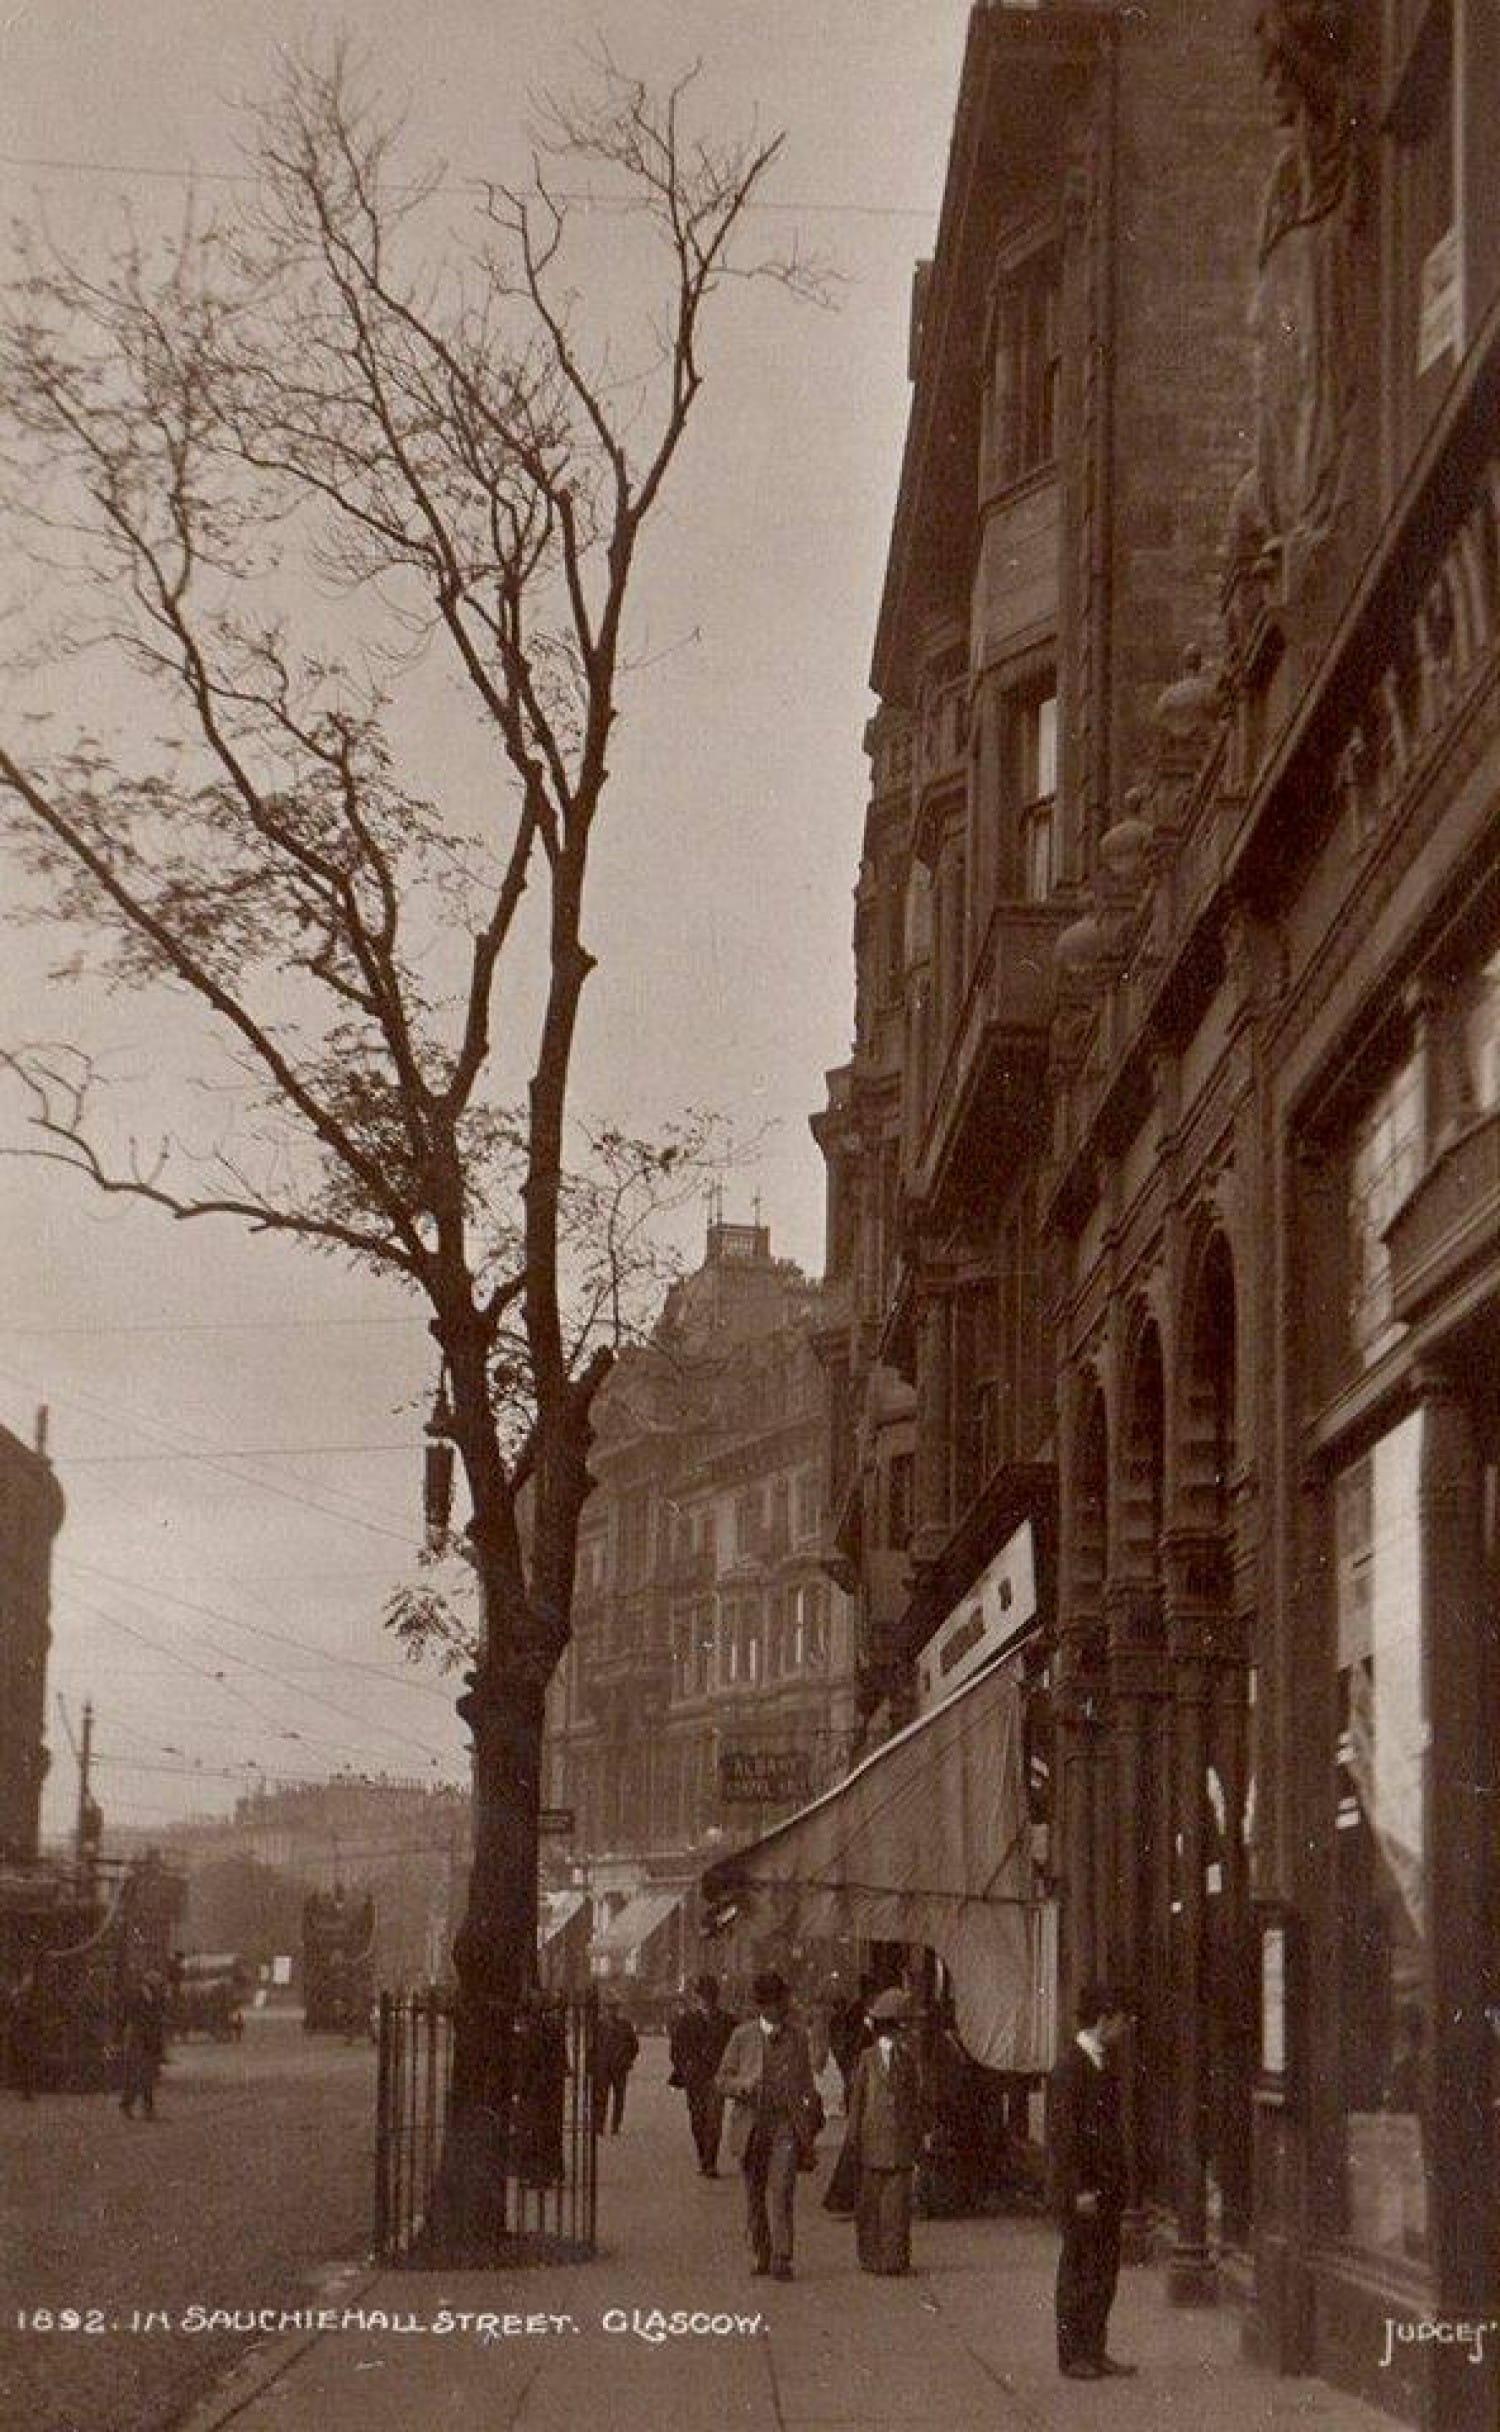 Sauchiehall Street, at Charing Cross, 1892